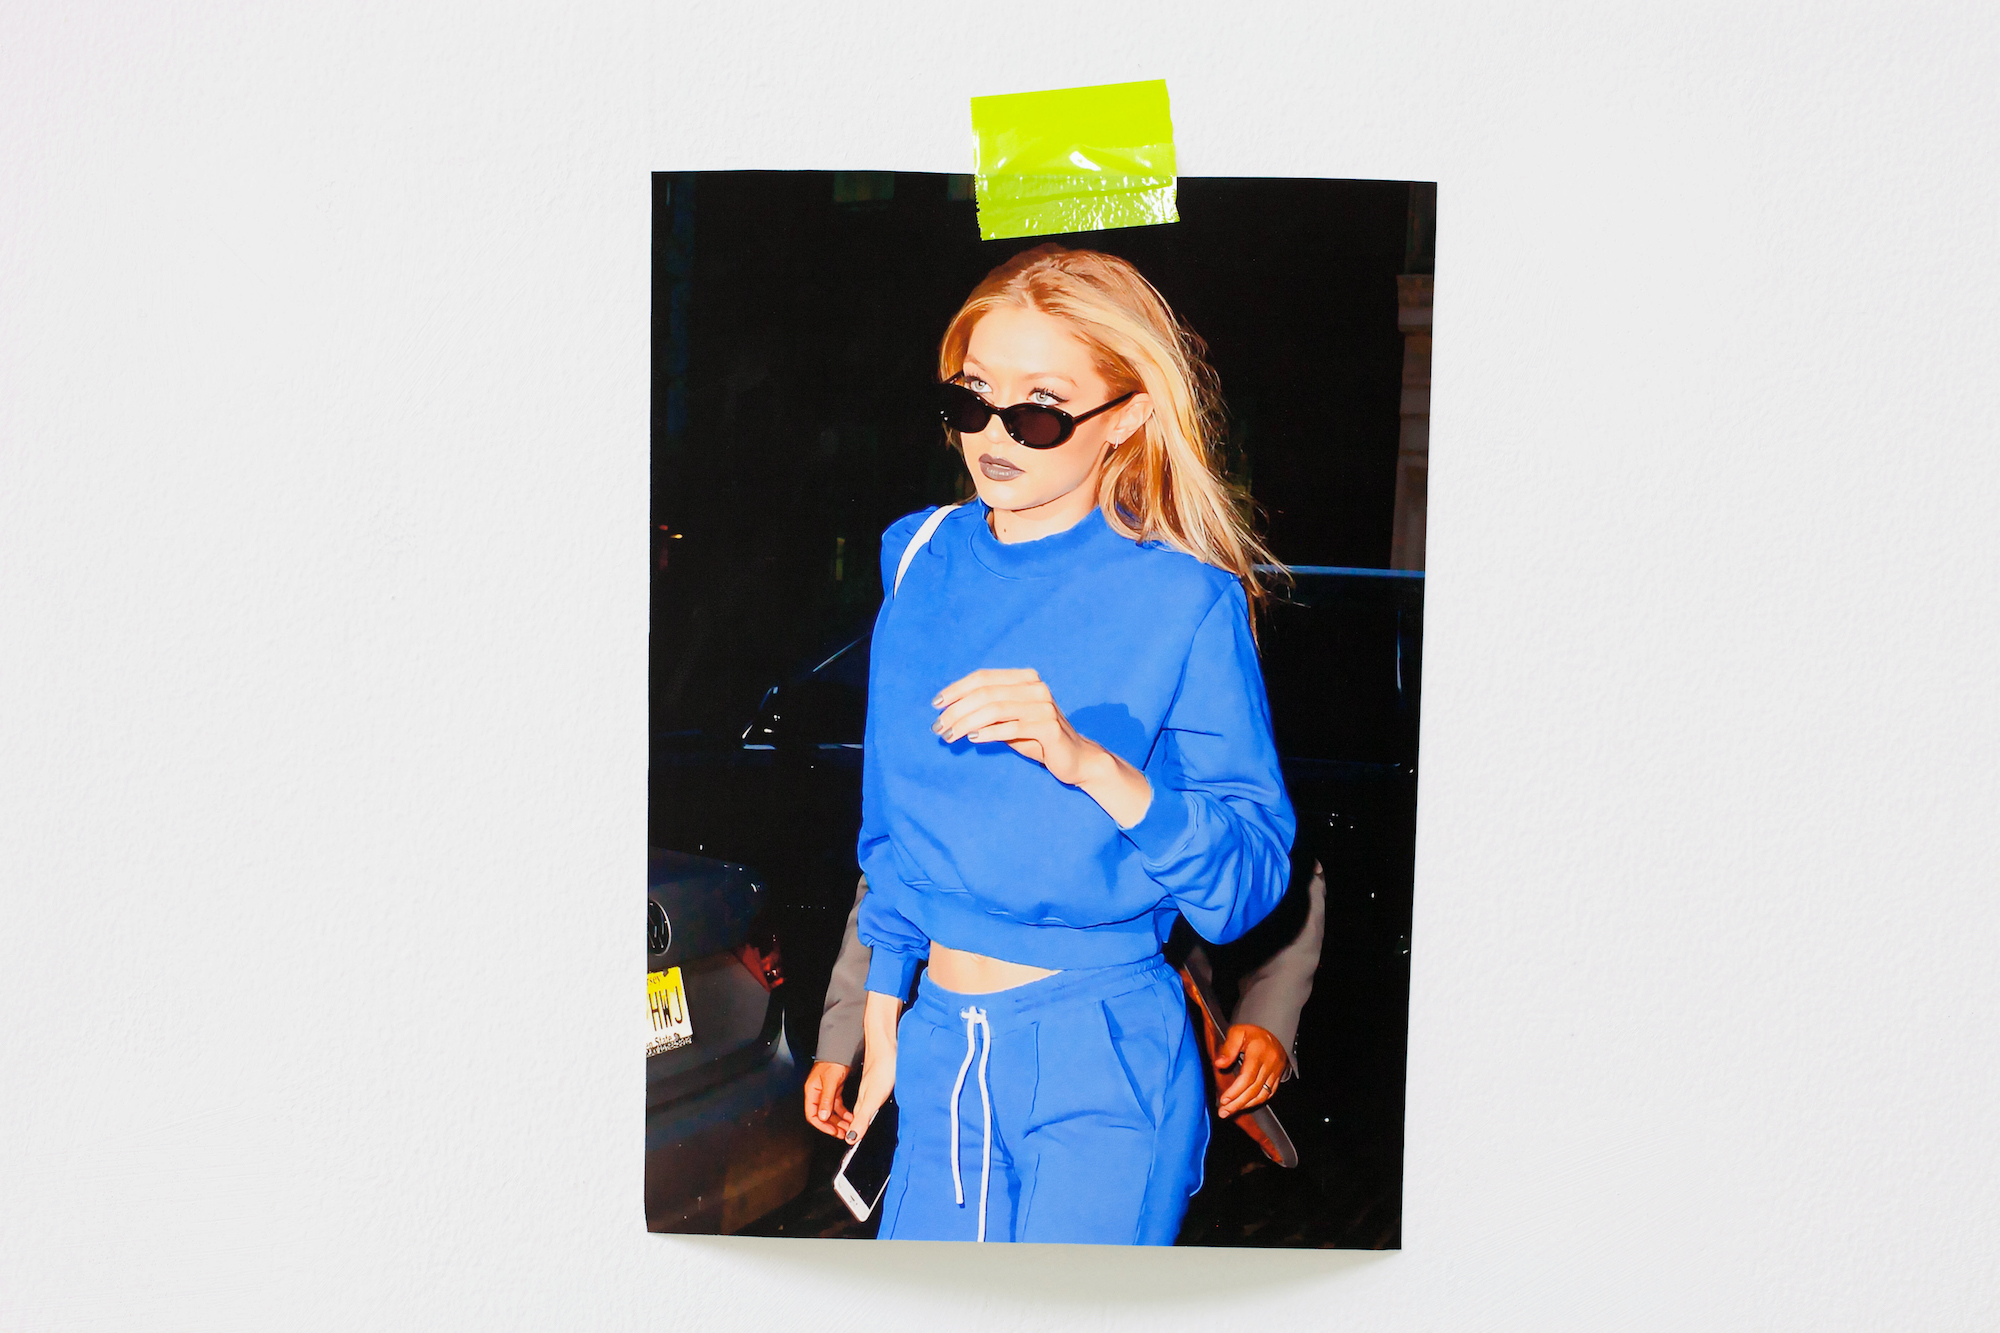 Raja'a Khalid  GIGI EYES   2017 Archival inkjet print, tape 25 x 35 cm *Photograph of supermodel Gigi taped to the wall.